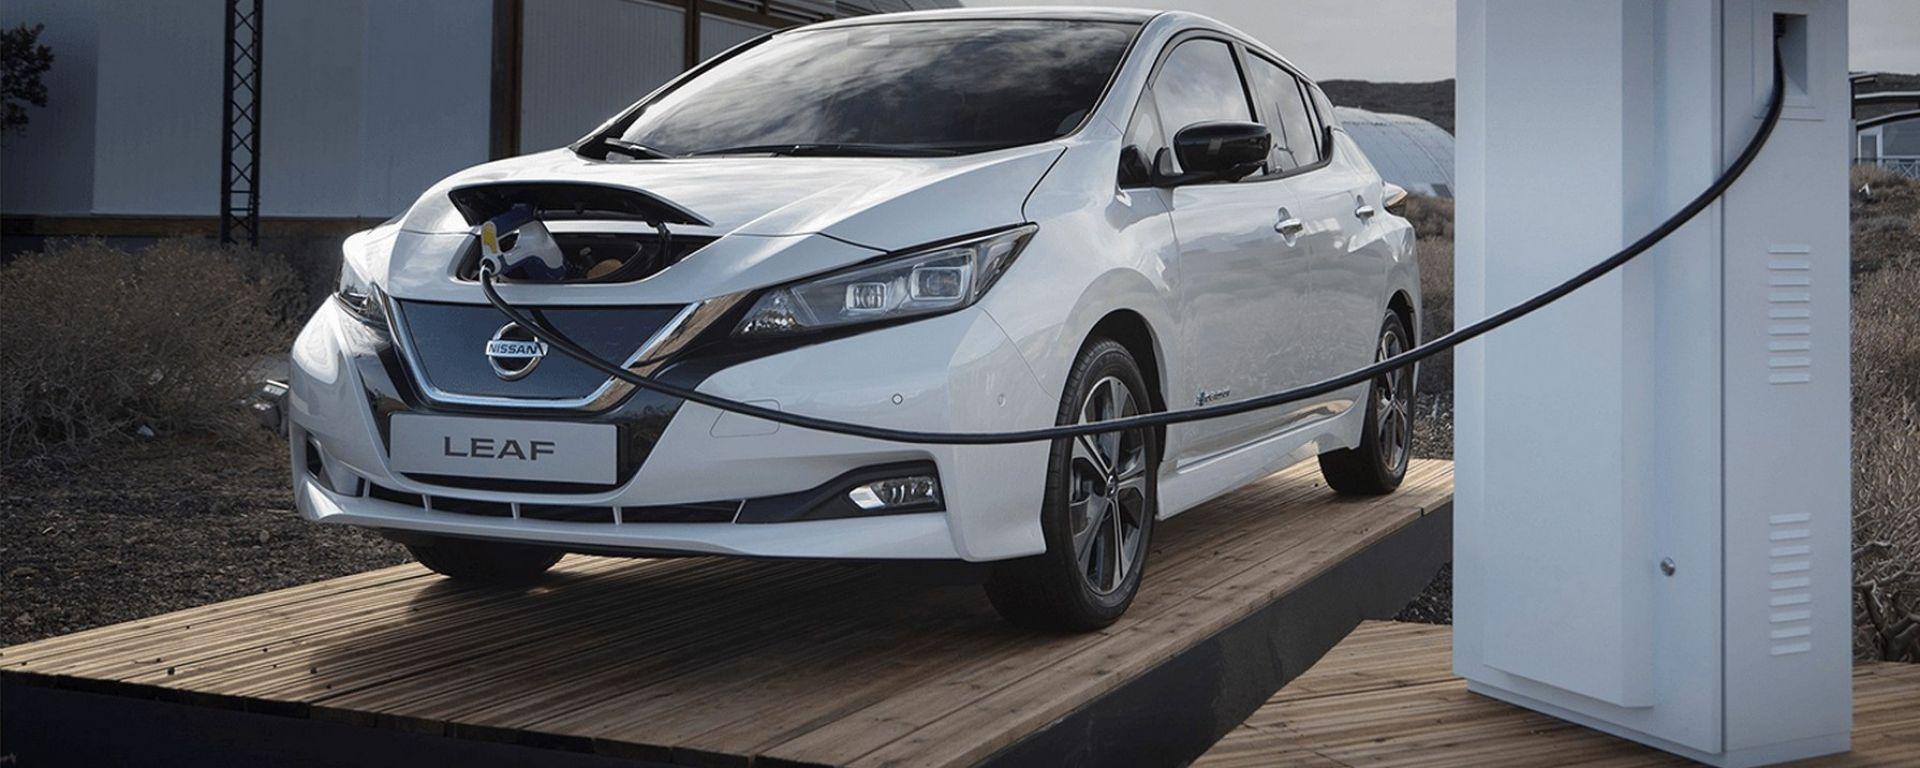 Nissan Leaf, ricarica rapida, ma forse non così rapida